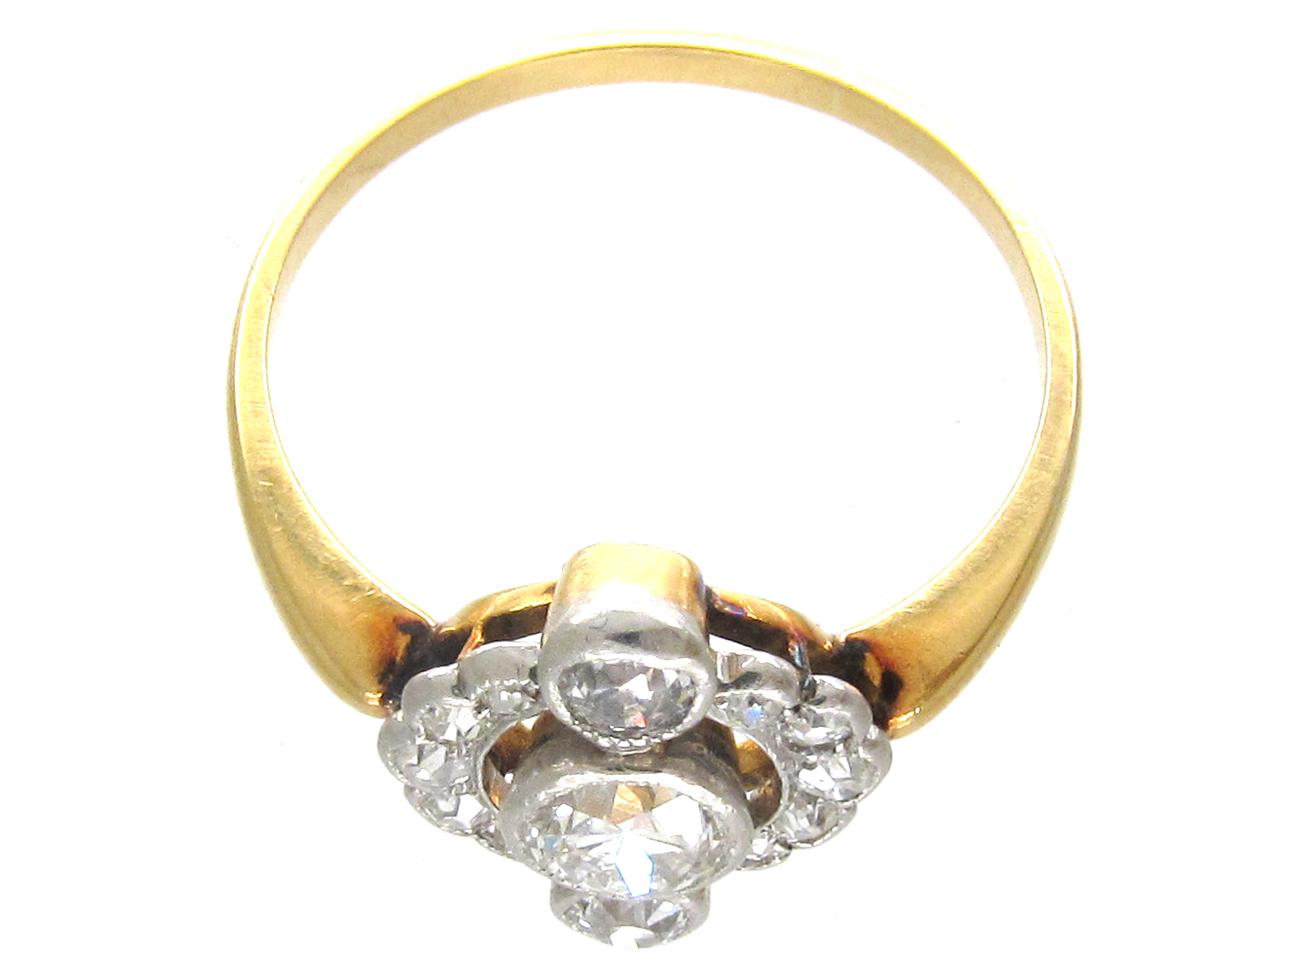 Art Deco Three Stone Diamond Cluster Ring